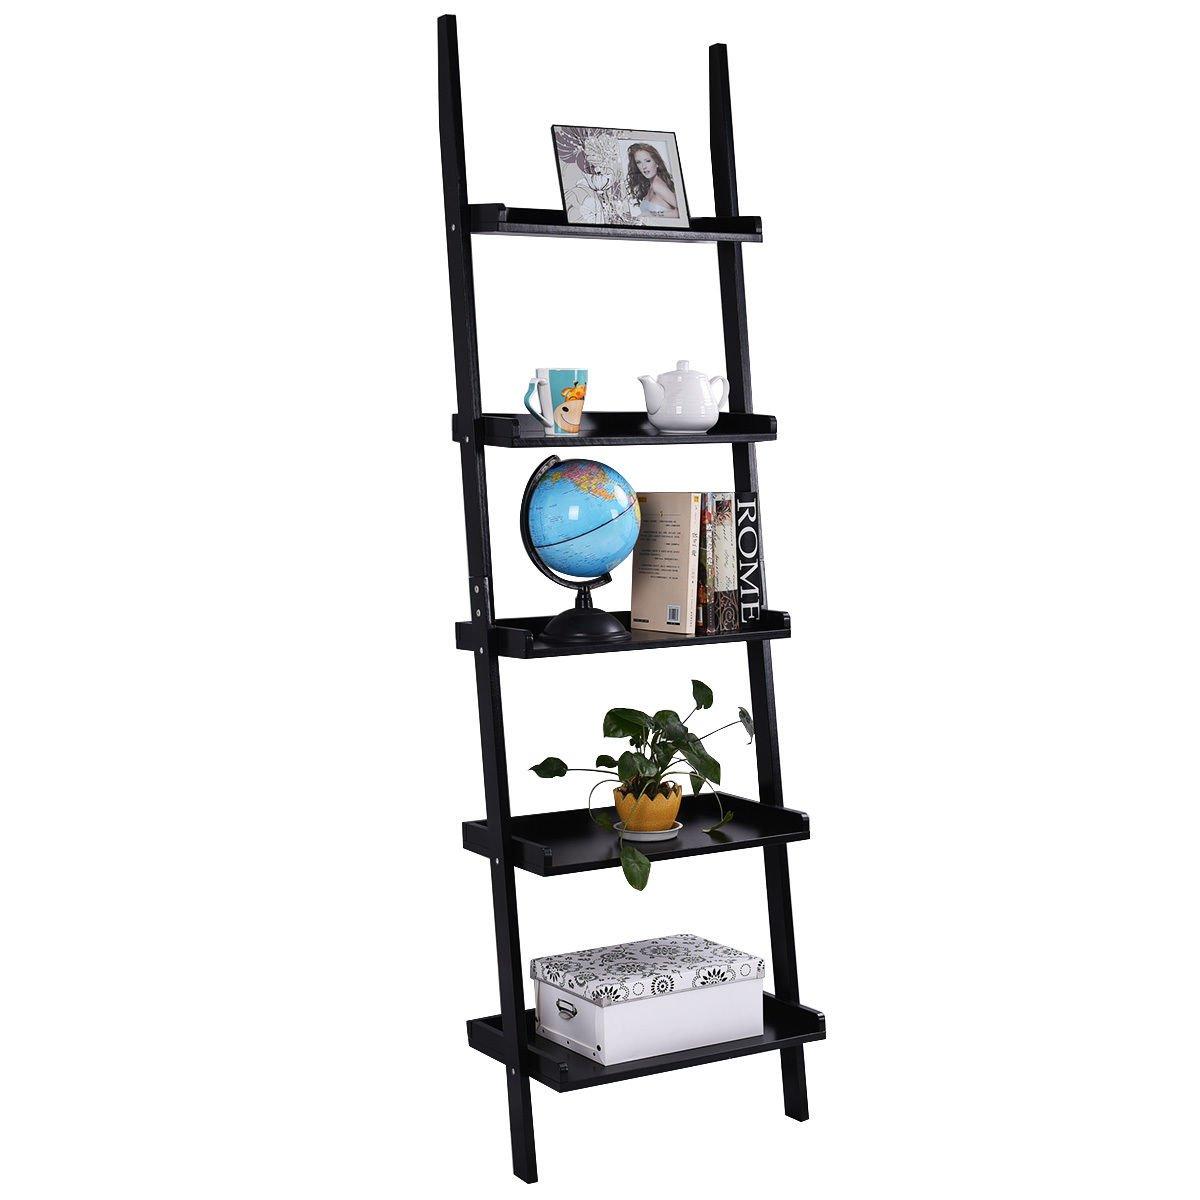 TANGKULA Ladder Bookcase 5-Tire Wood Leaning Shelf Wall Plant Shelf Ladder Home Office Modern Flower Book Display Shelf Storage Rack Stable A-Frame Wooden Ladder Shelf (Black)